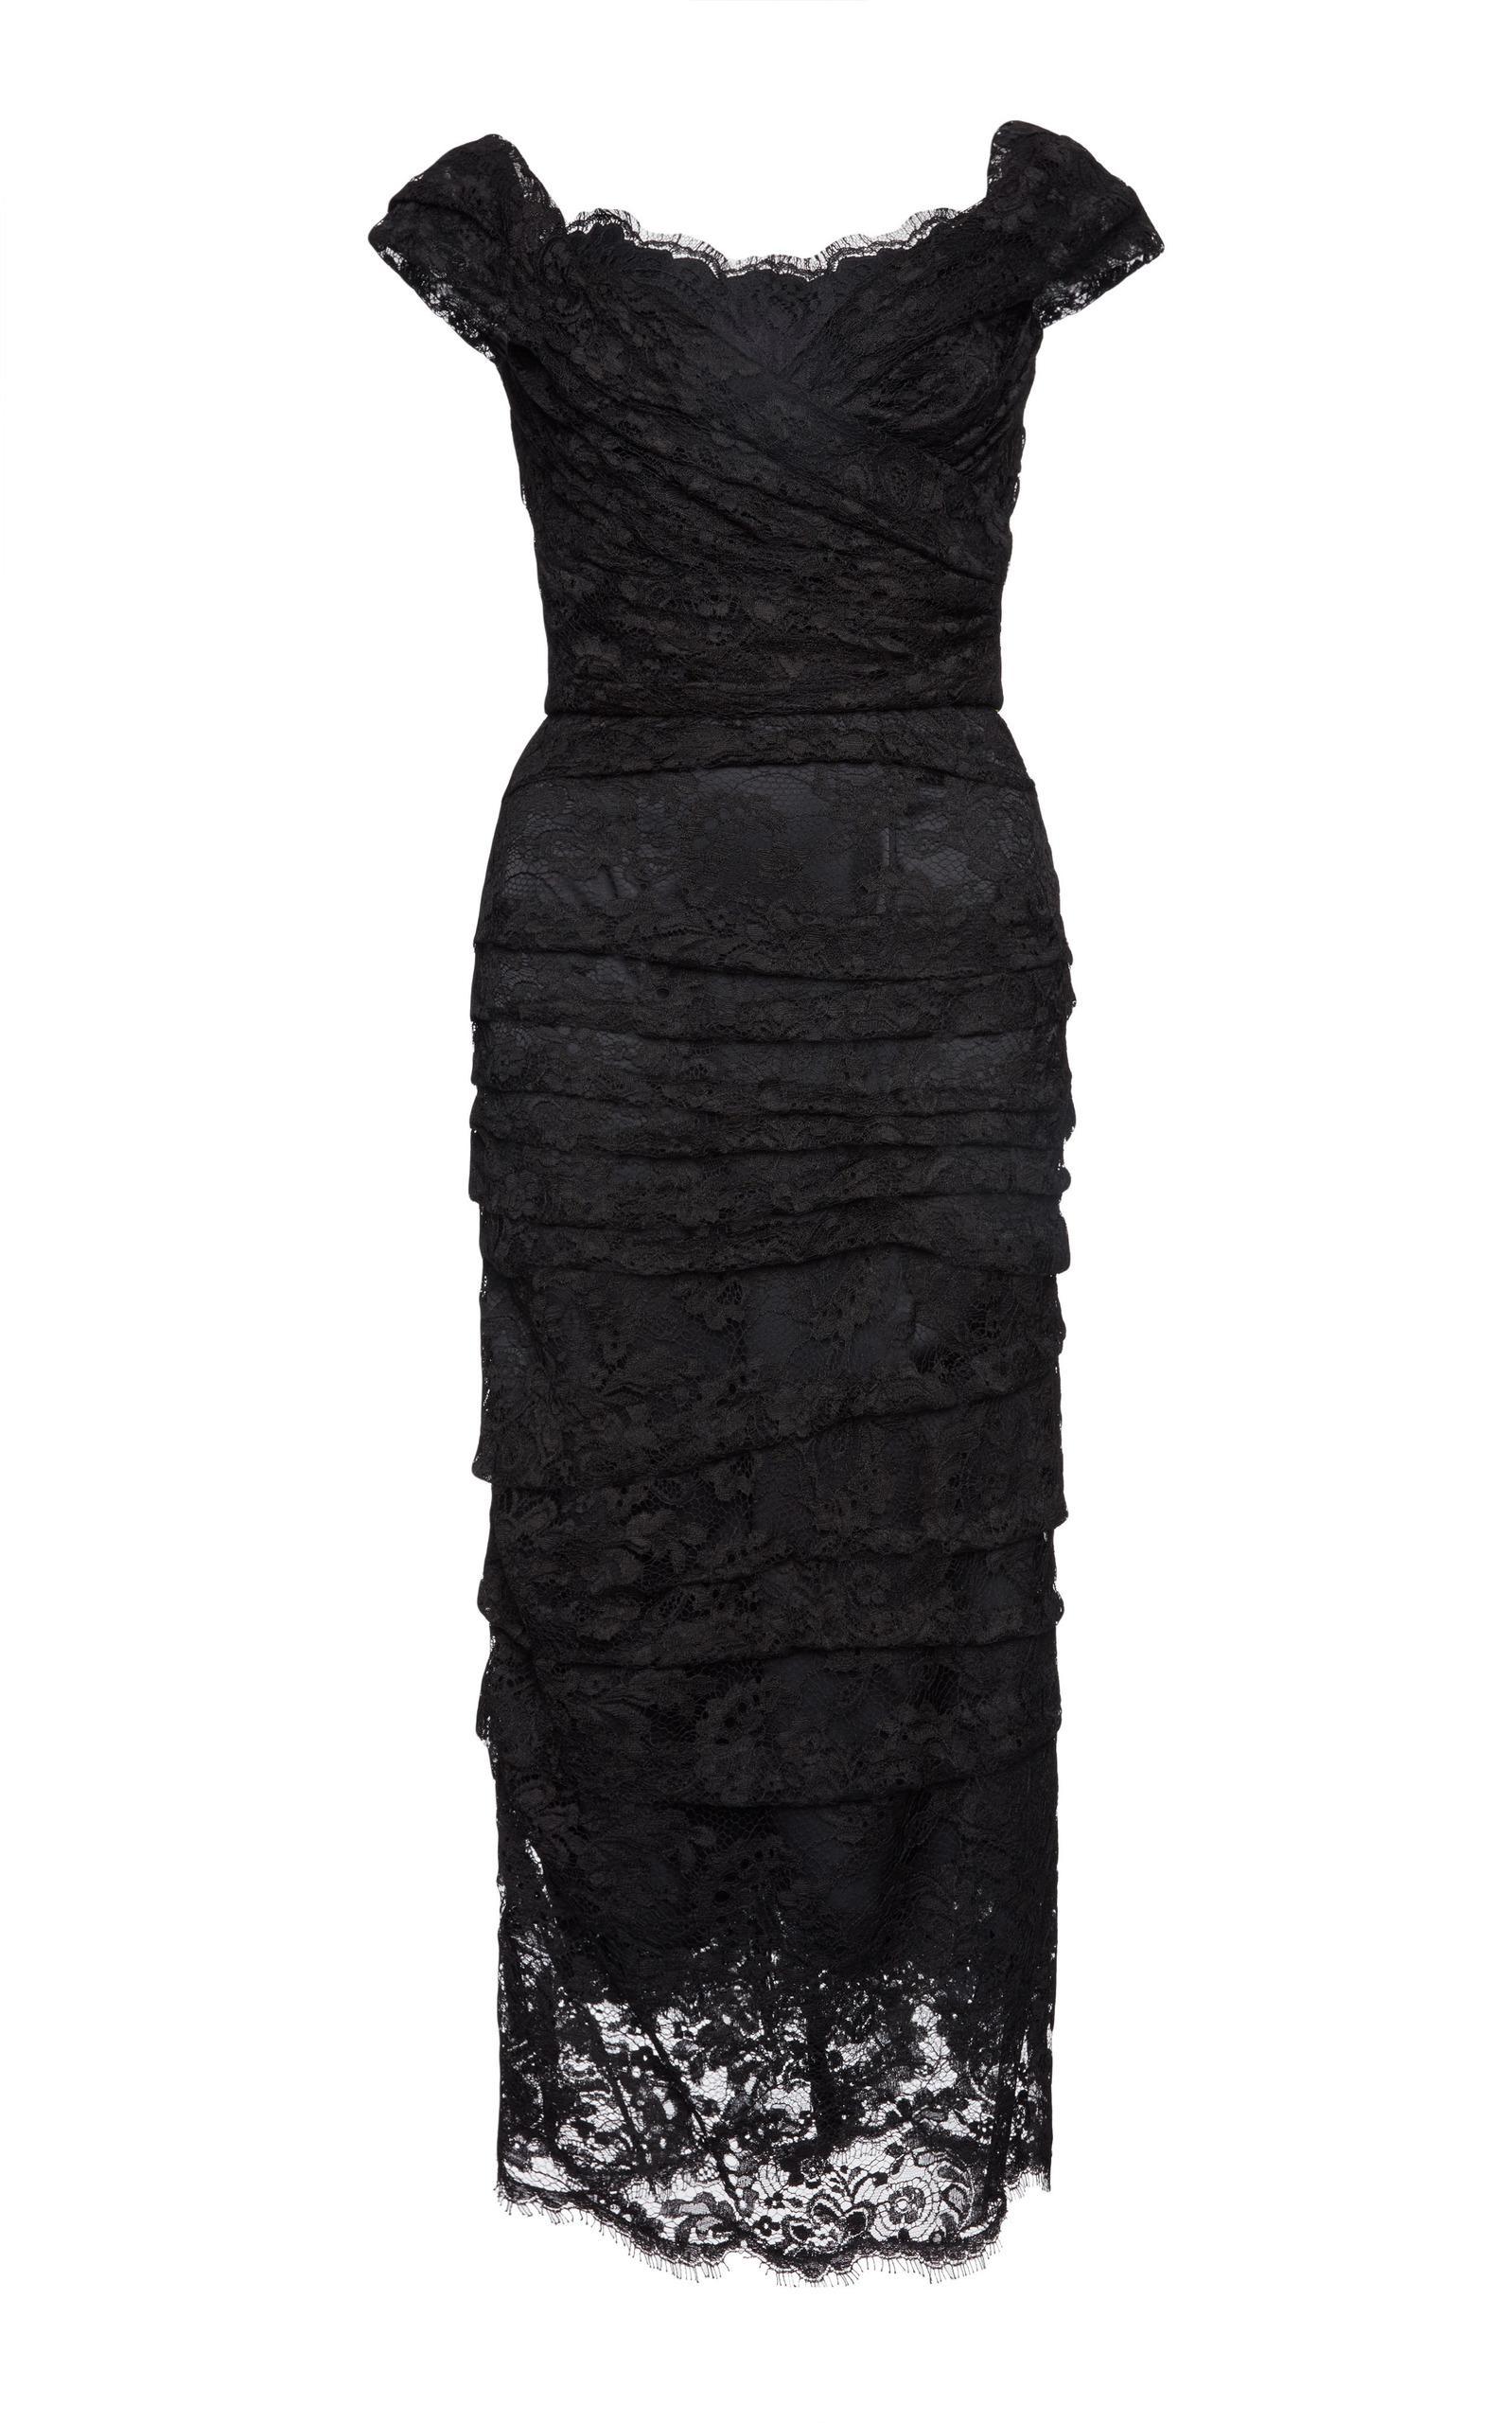 Dolce & Gabbana Off The Shoulder Lace Dress In Black